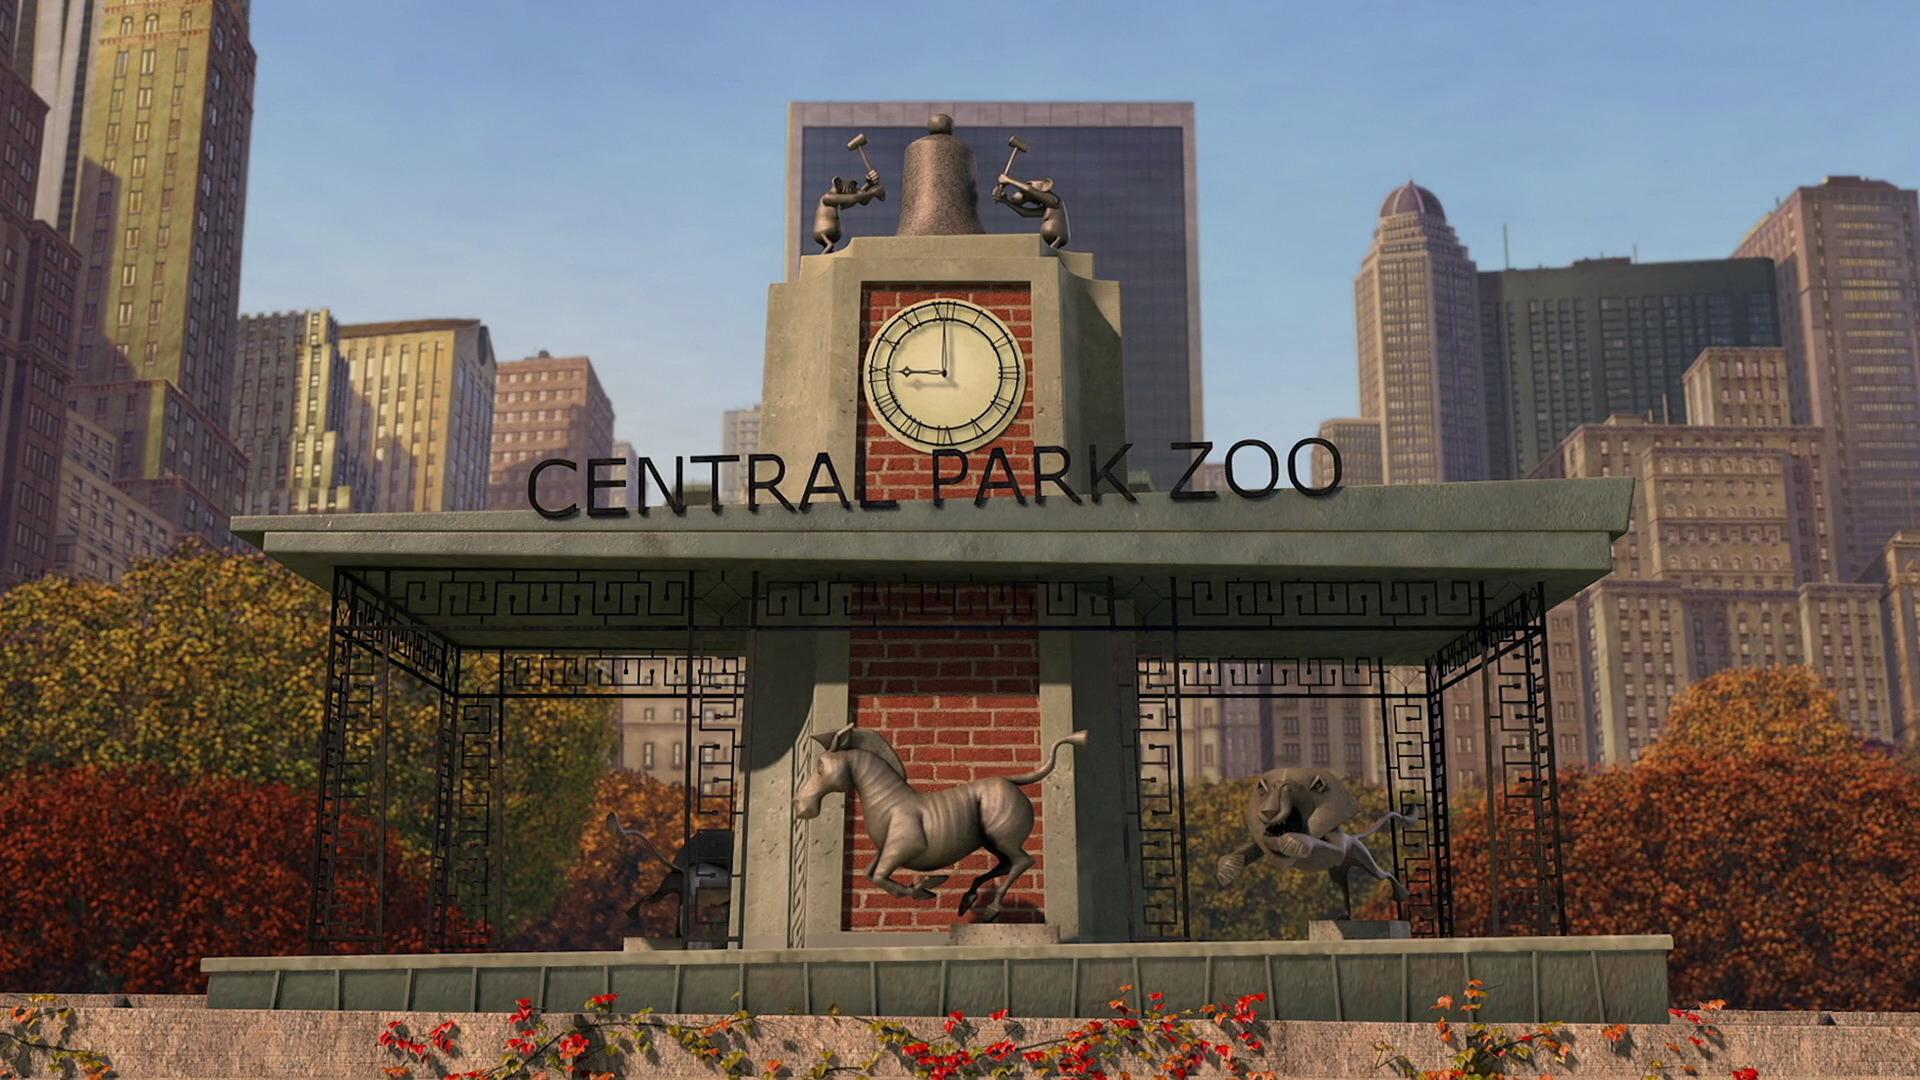 Central Park Zoo Dreamworks Animation Wiki Fandom